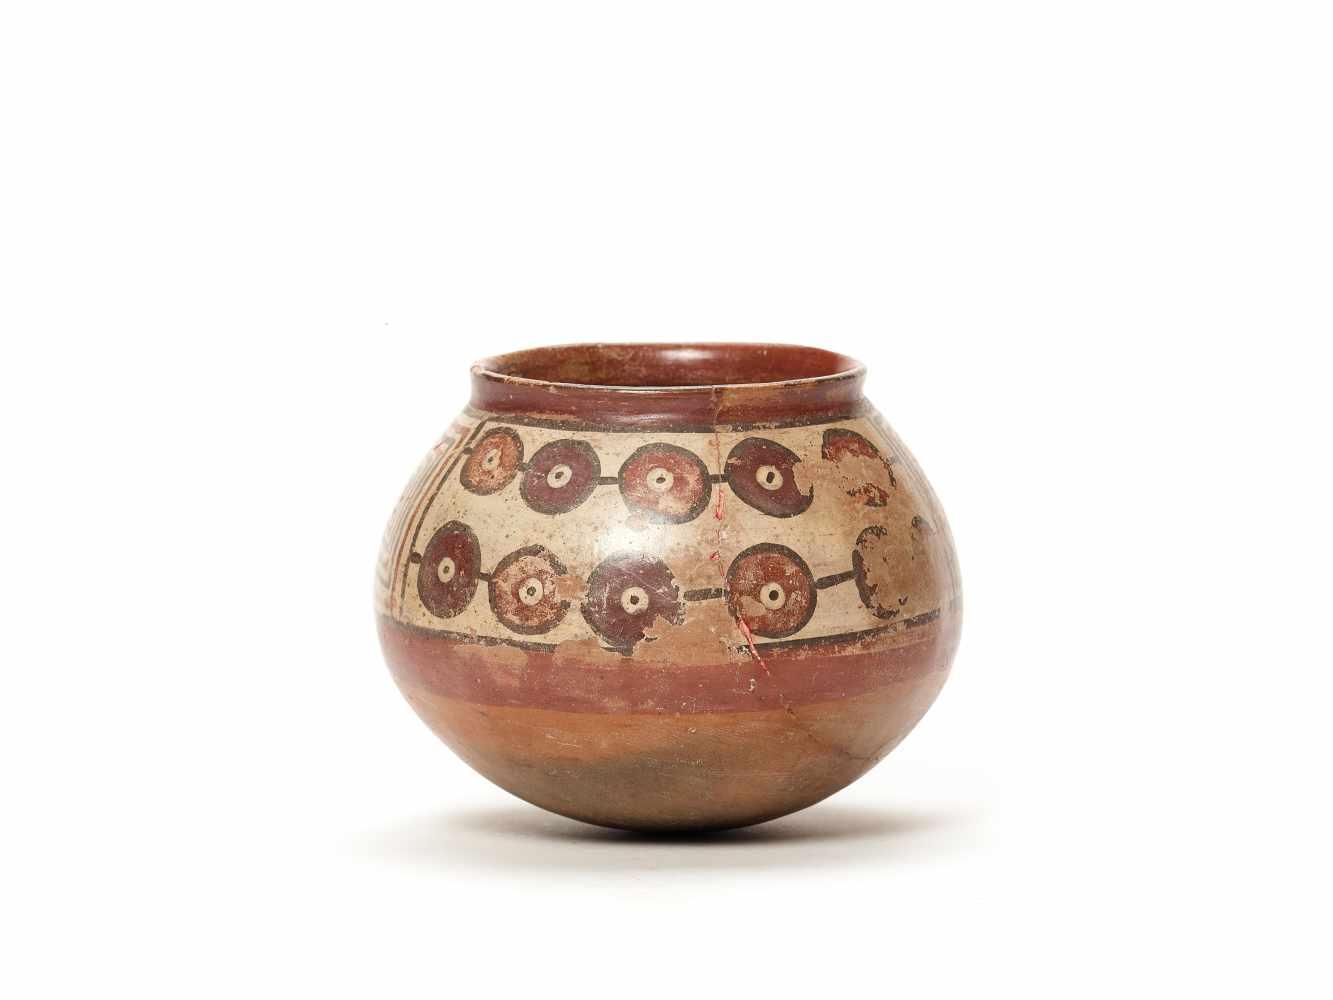 PAINTED CLAY POT - NAZCA, PERU, C. 300-600 ADPainted clayNazca, Peru, c. 300-600 ADSpherical form